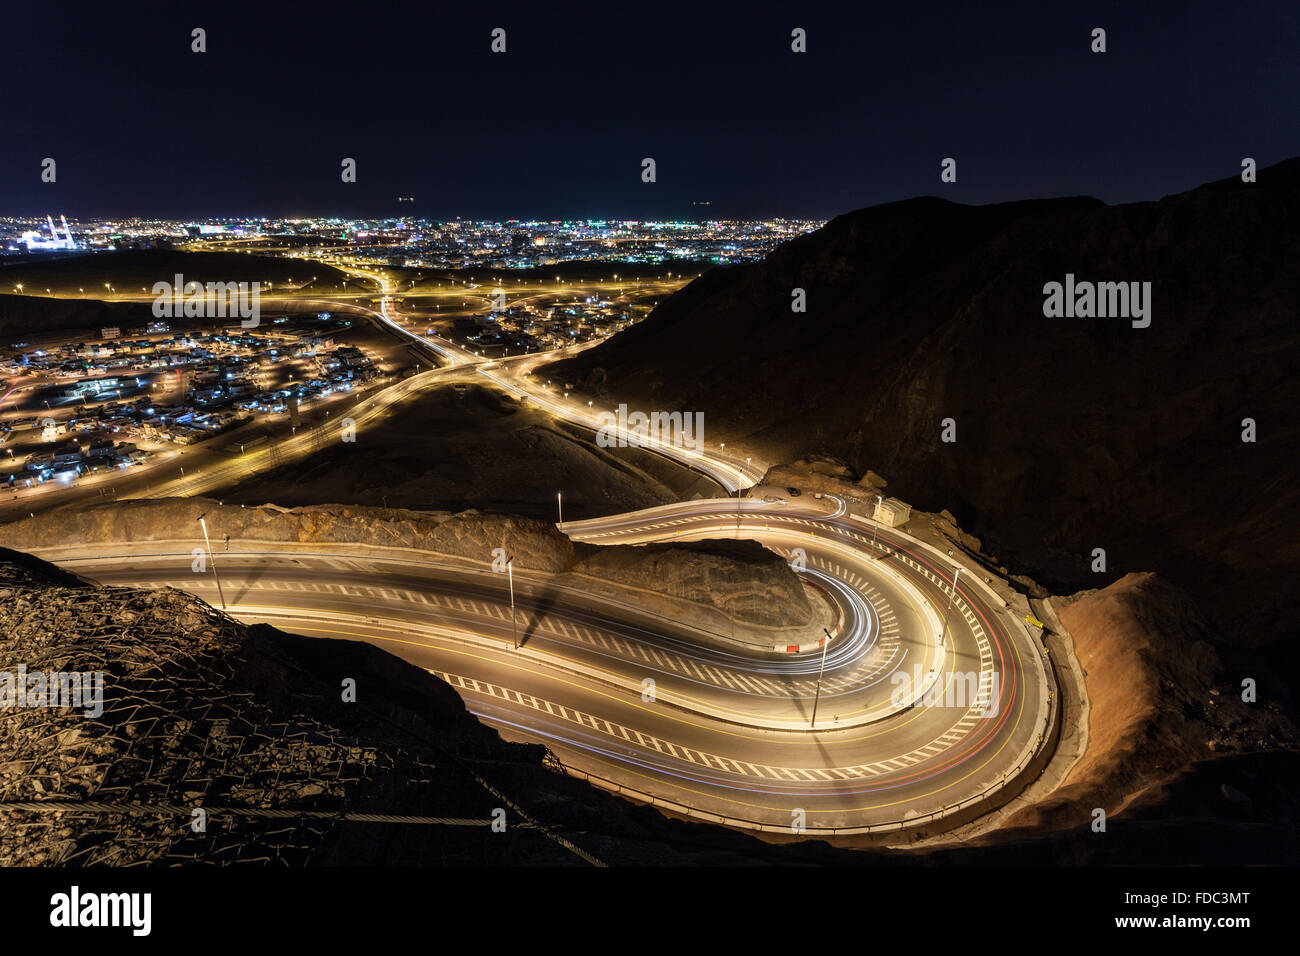 Strada tortuosa in Muscat Oman Immagini Stock